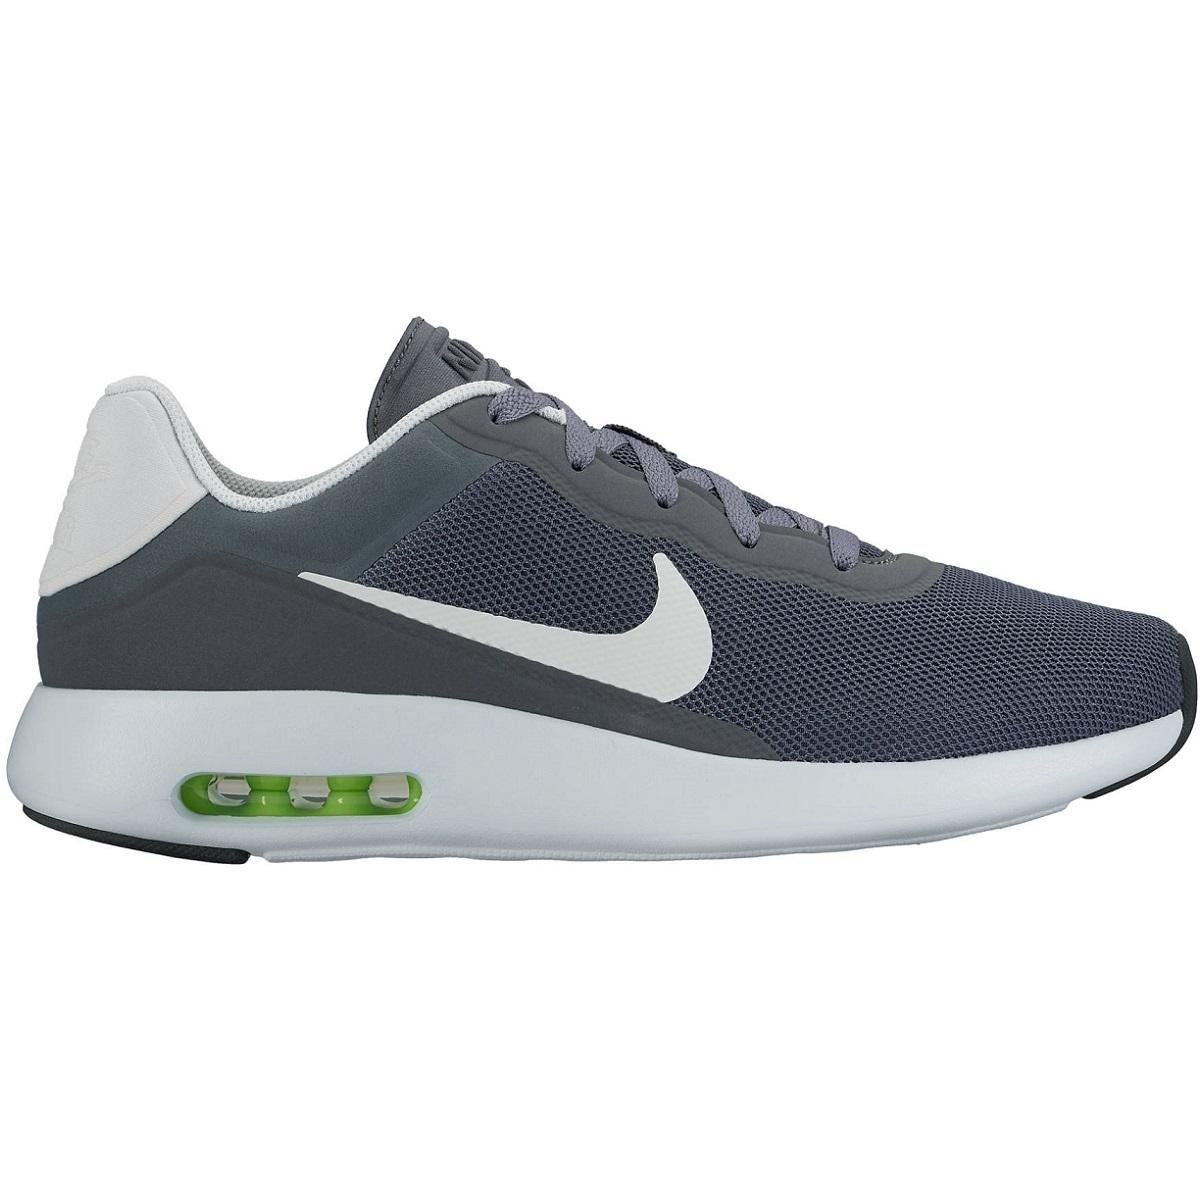 Nike Mens Air Max Modern Essential Mesh Trainers B01N637CD2 EUR 47 Dark Grey/Black/Volt